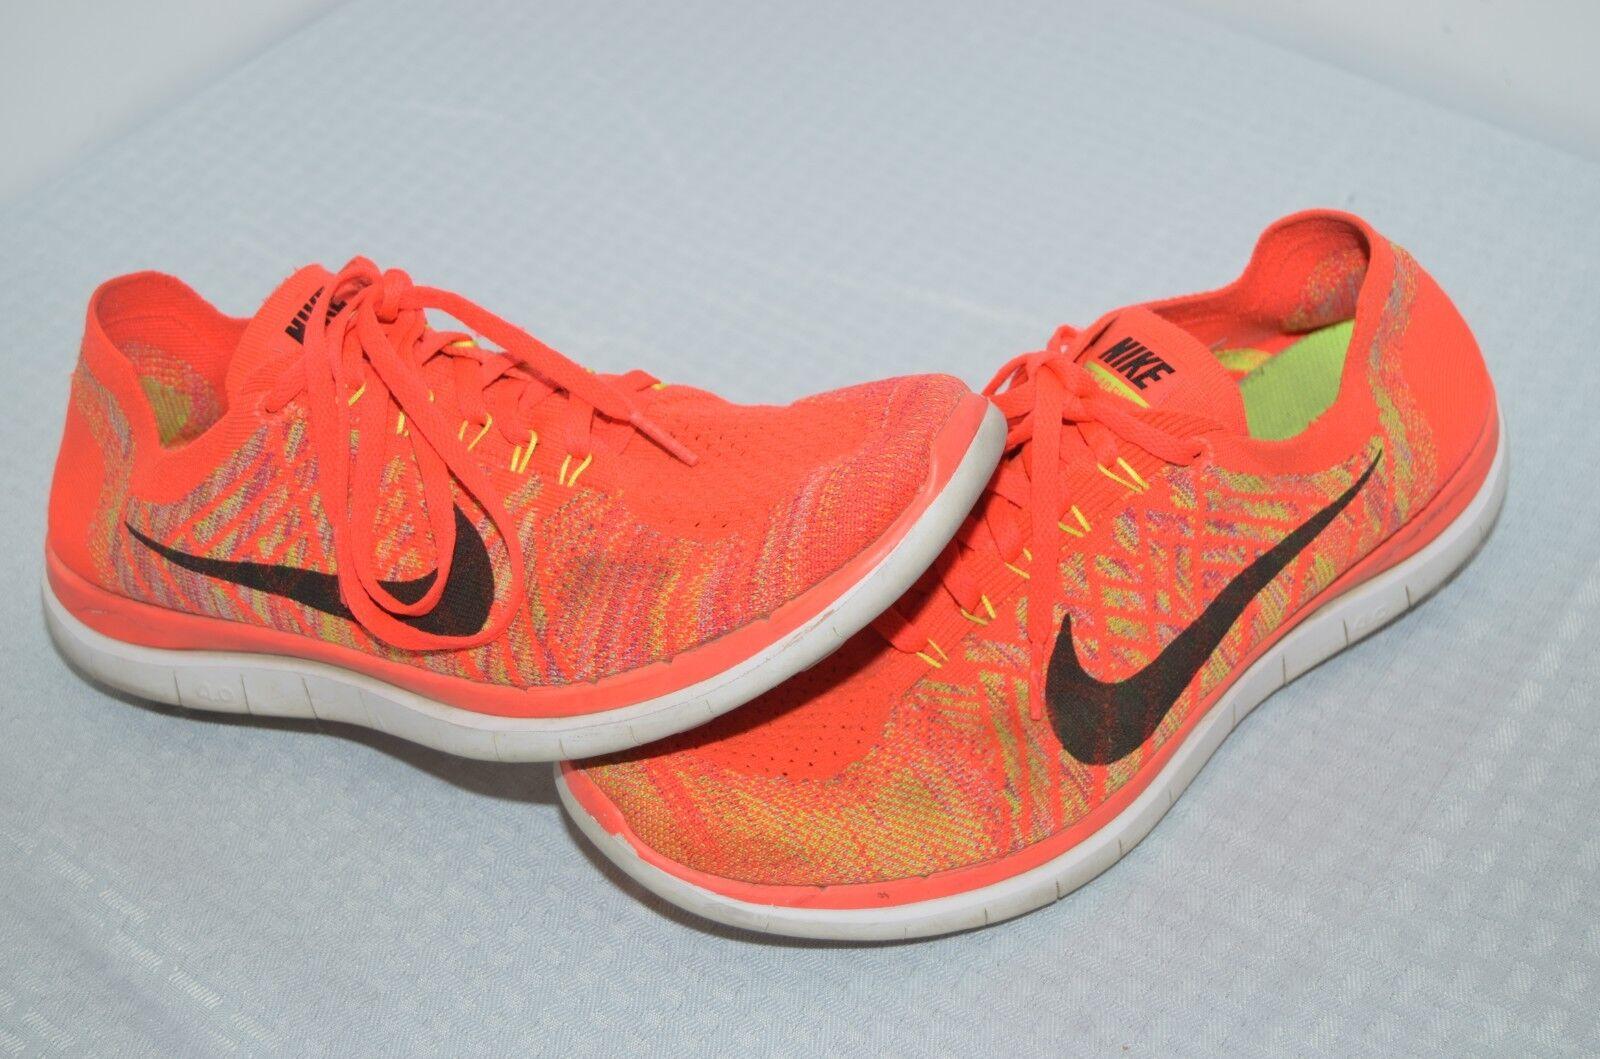 Nike Free 4.0 Flyknit Running shoes Neon Red orange Green Knit Light Size 11 US